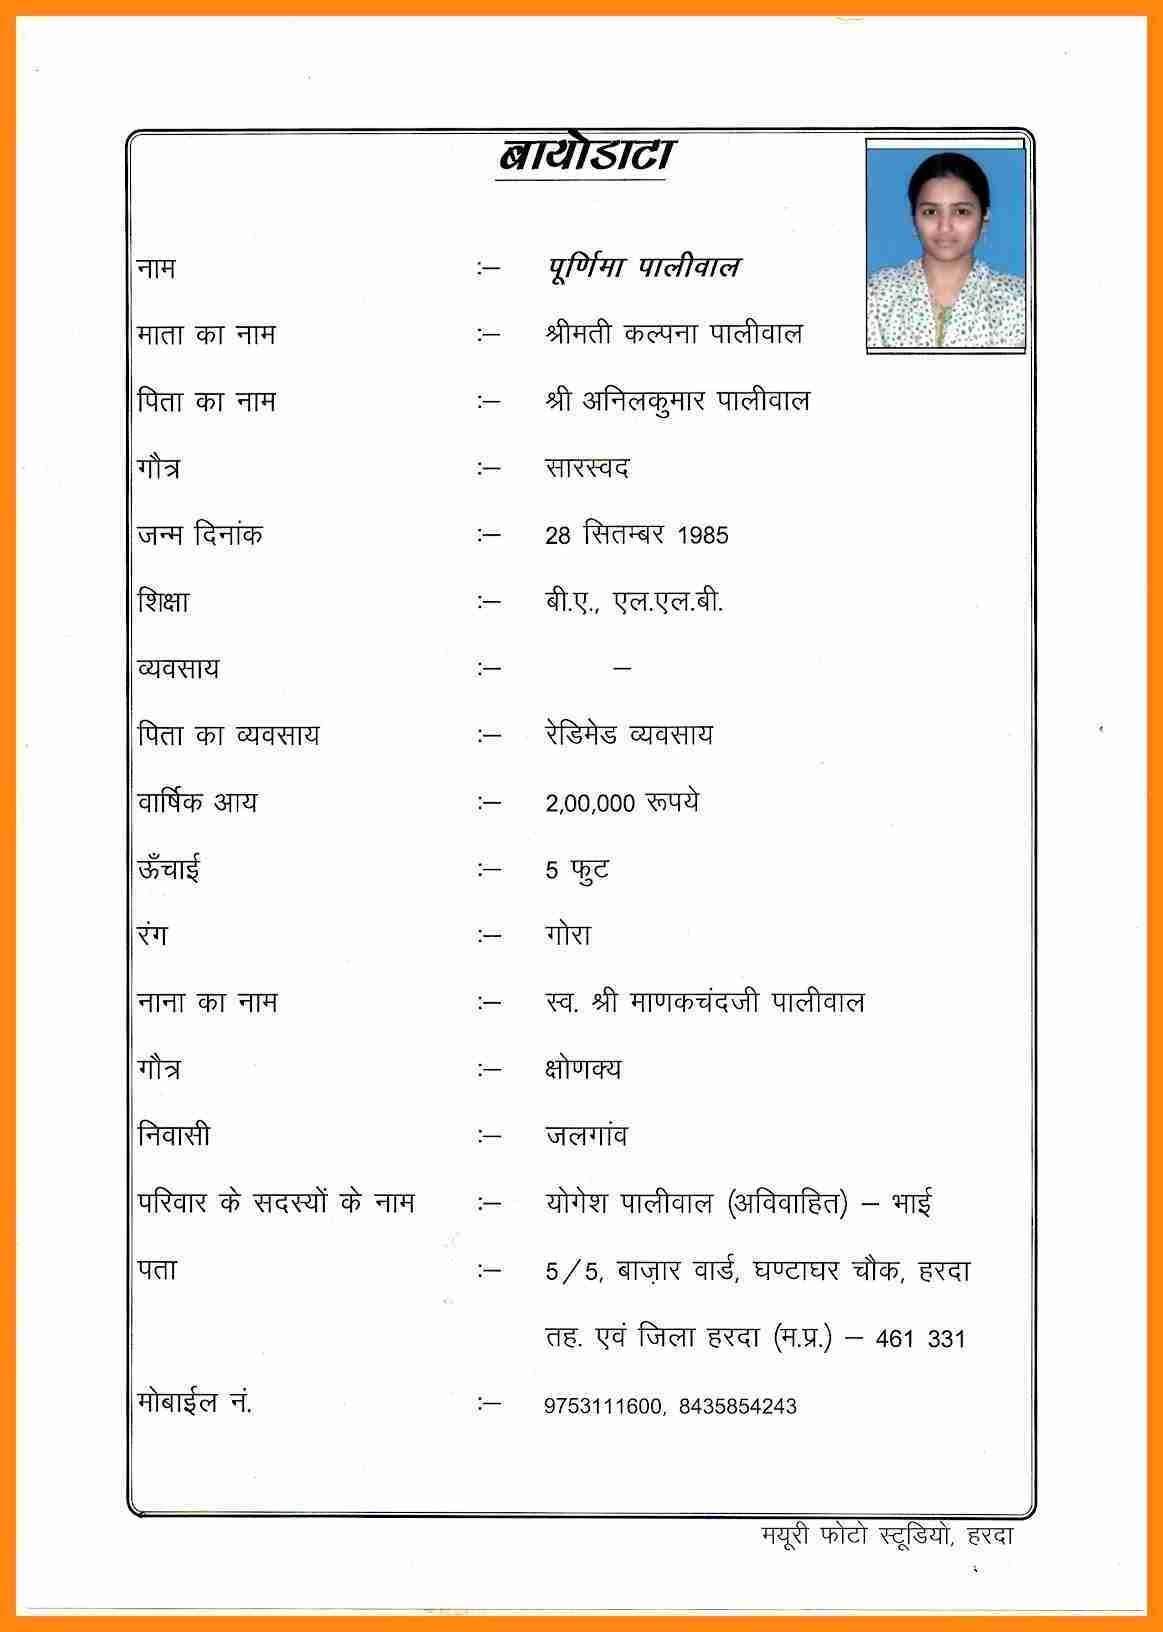 Biodata Format In Hindi Pdf Google Search Marriage Biodata Format Bio Data For Marriage Biodata Format